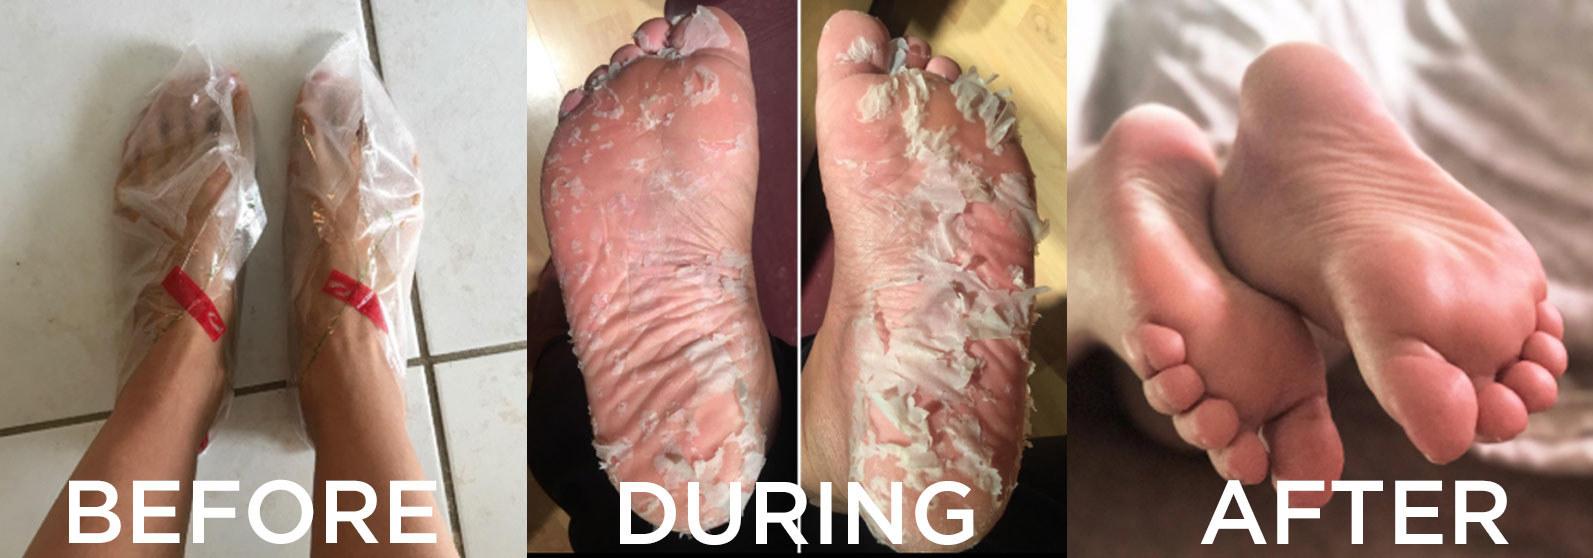 before: feet in plastic socks during: peeling feet after: smooth feet